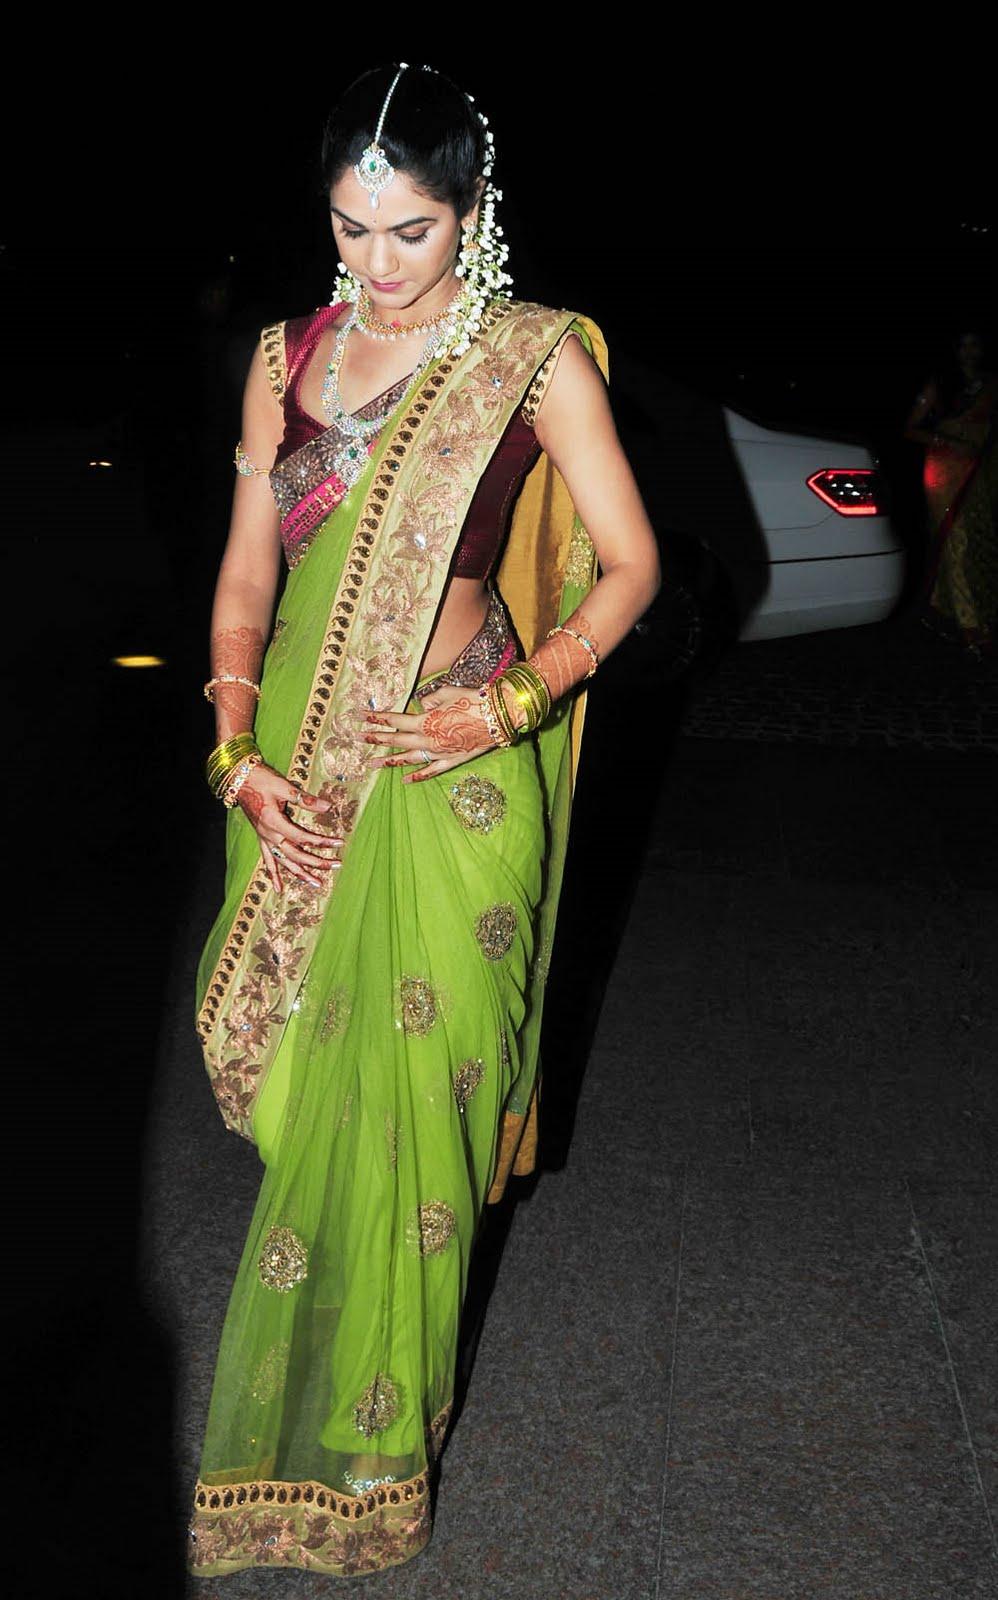 Allu Arjun Sneha reddy Engagement Photos  27 Pics